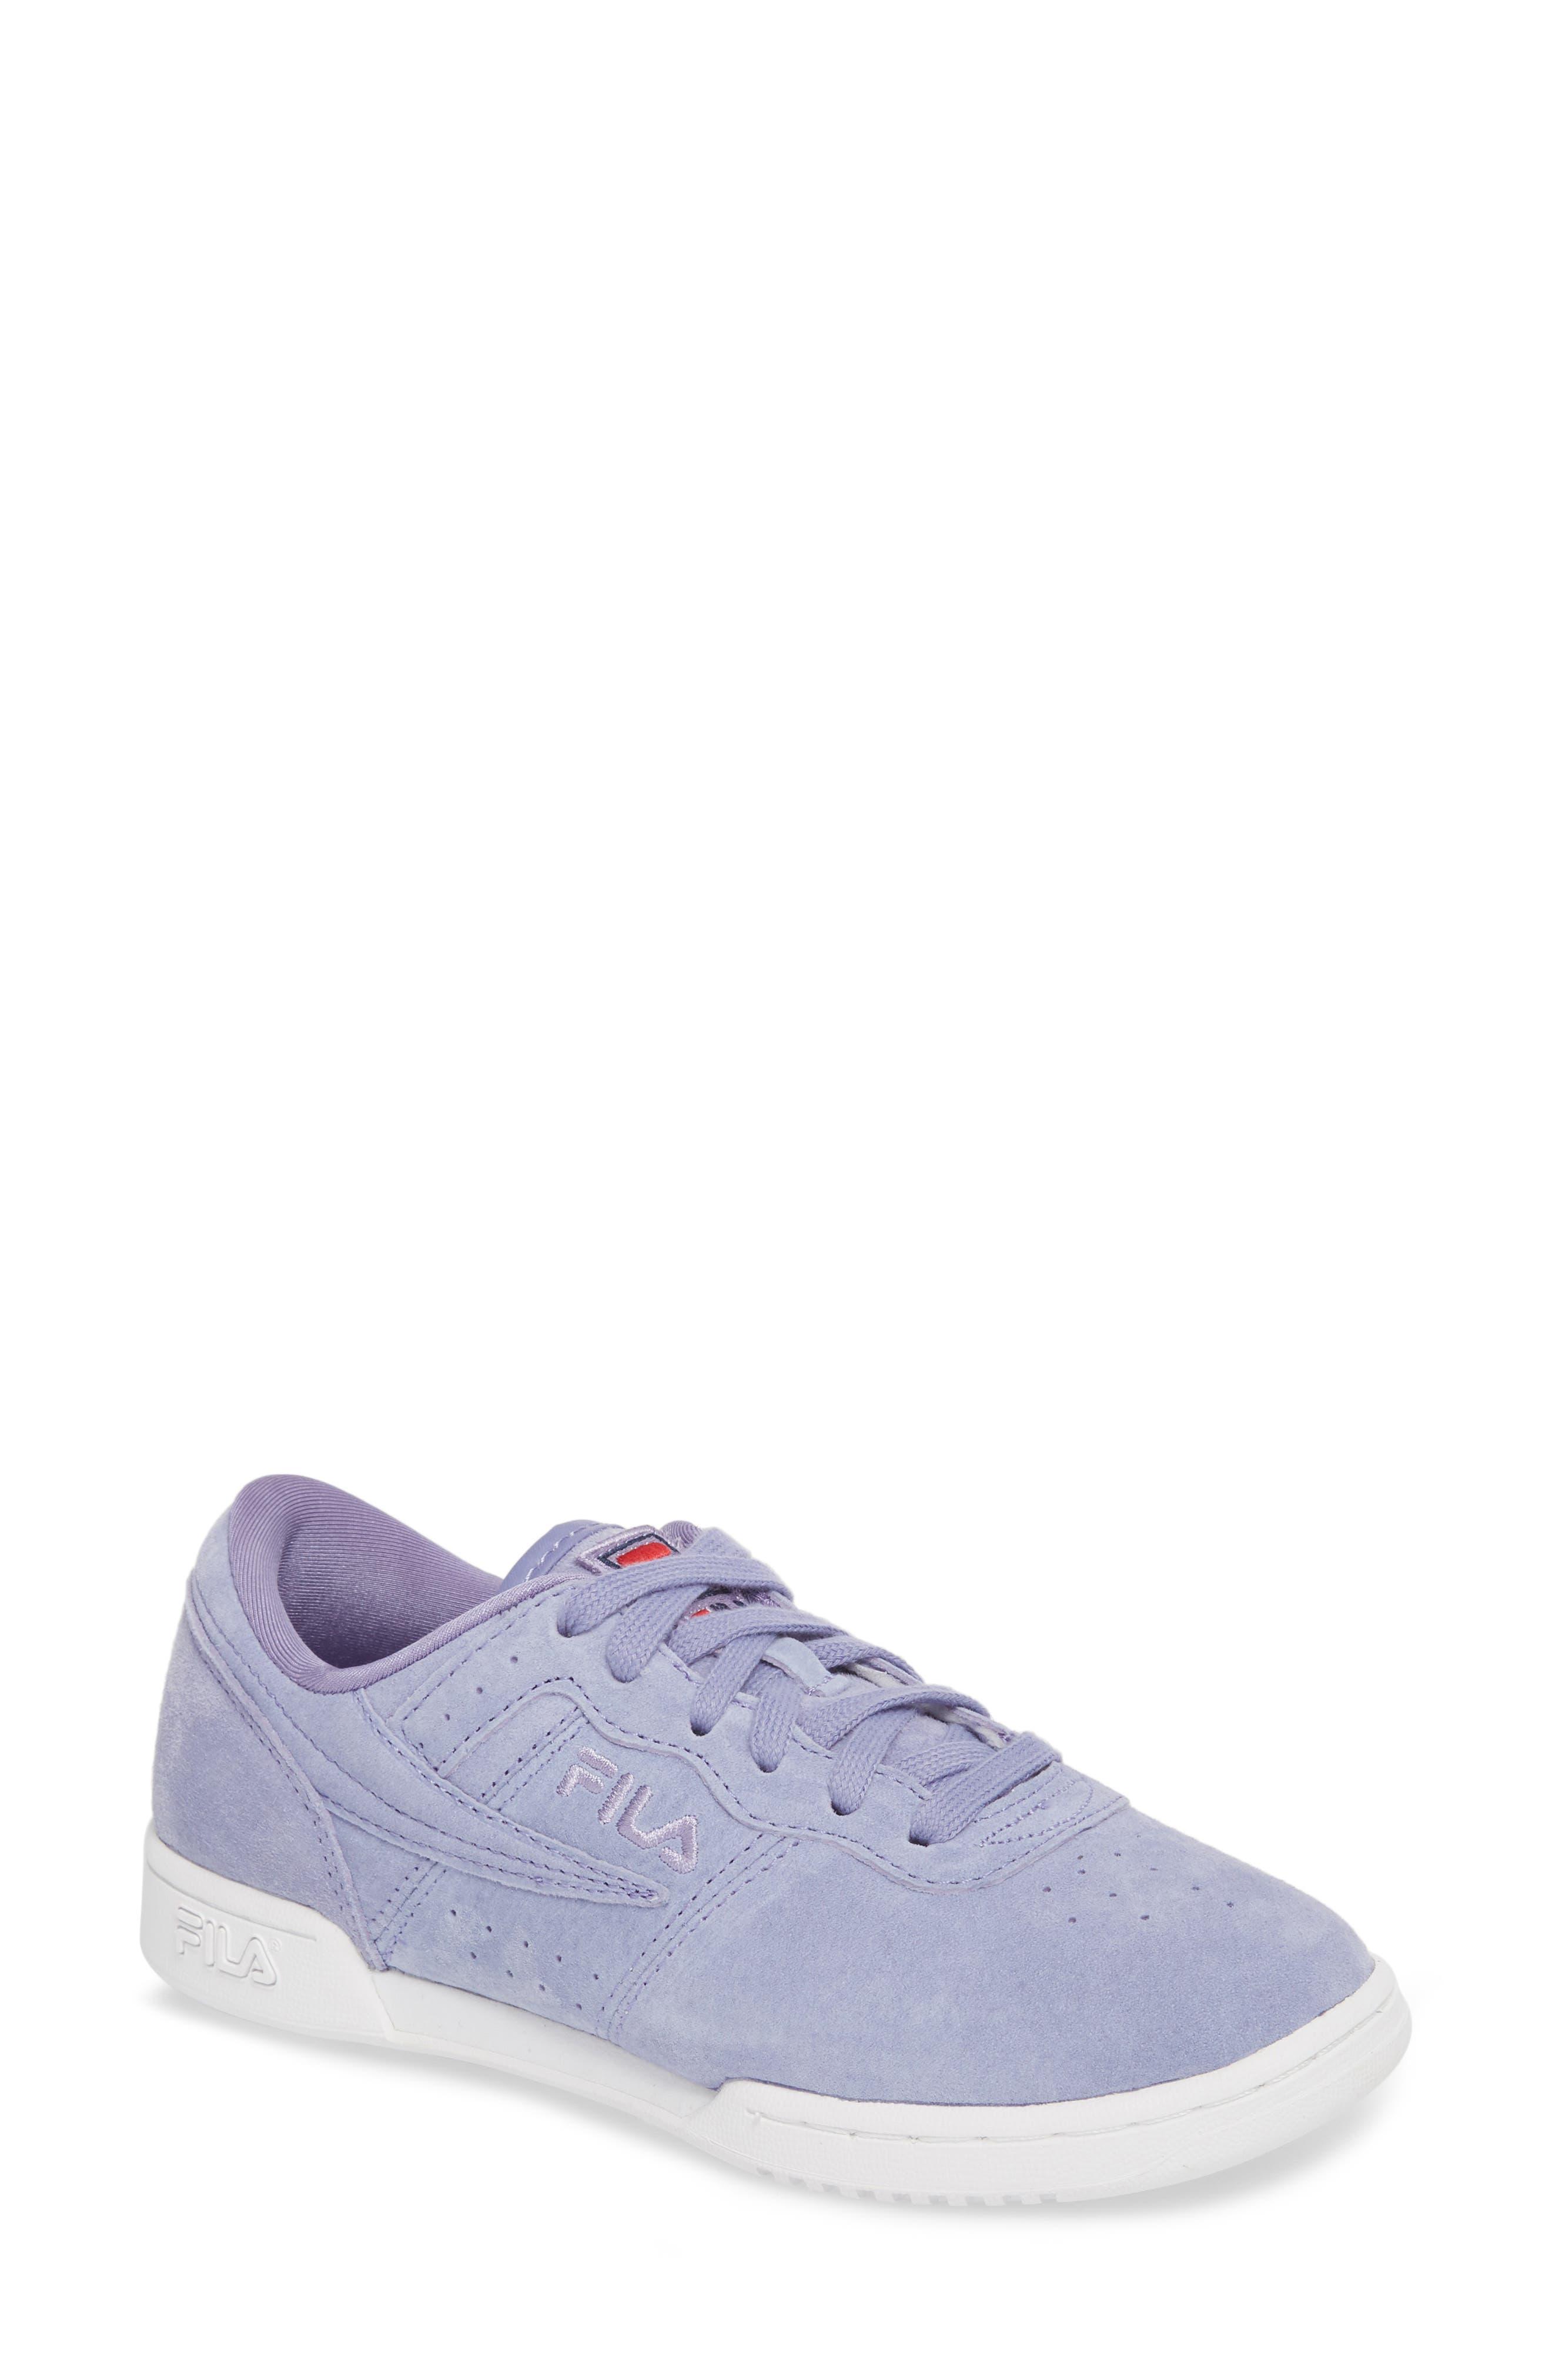 FILA Original Fitness Premium Sneaker (Women)